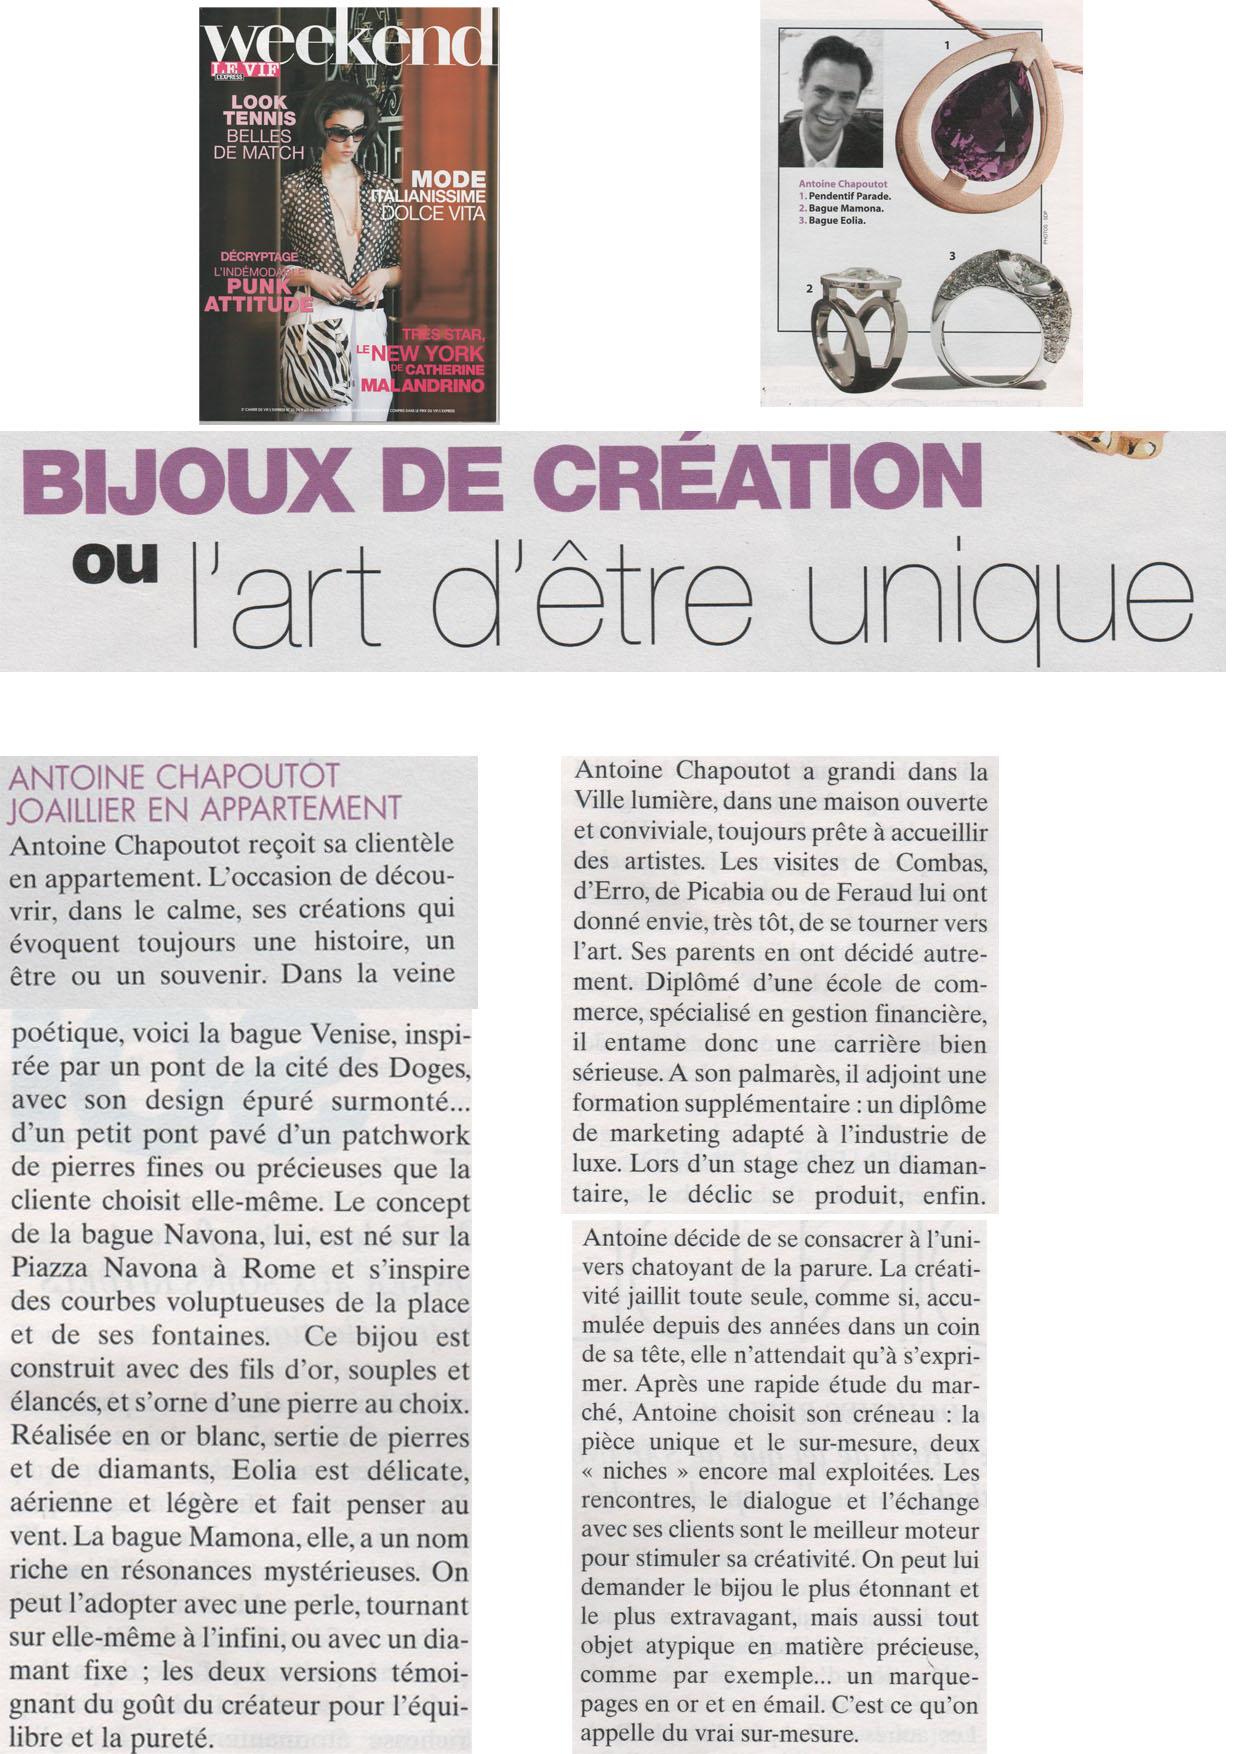 2006 Le Vif (L'Express).jpg